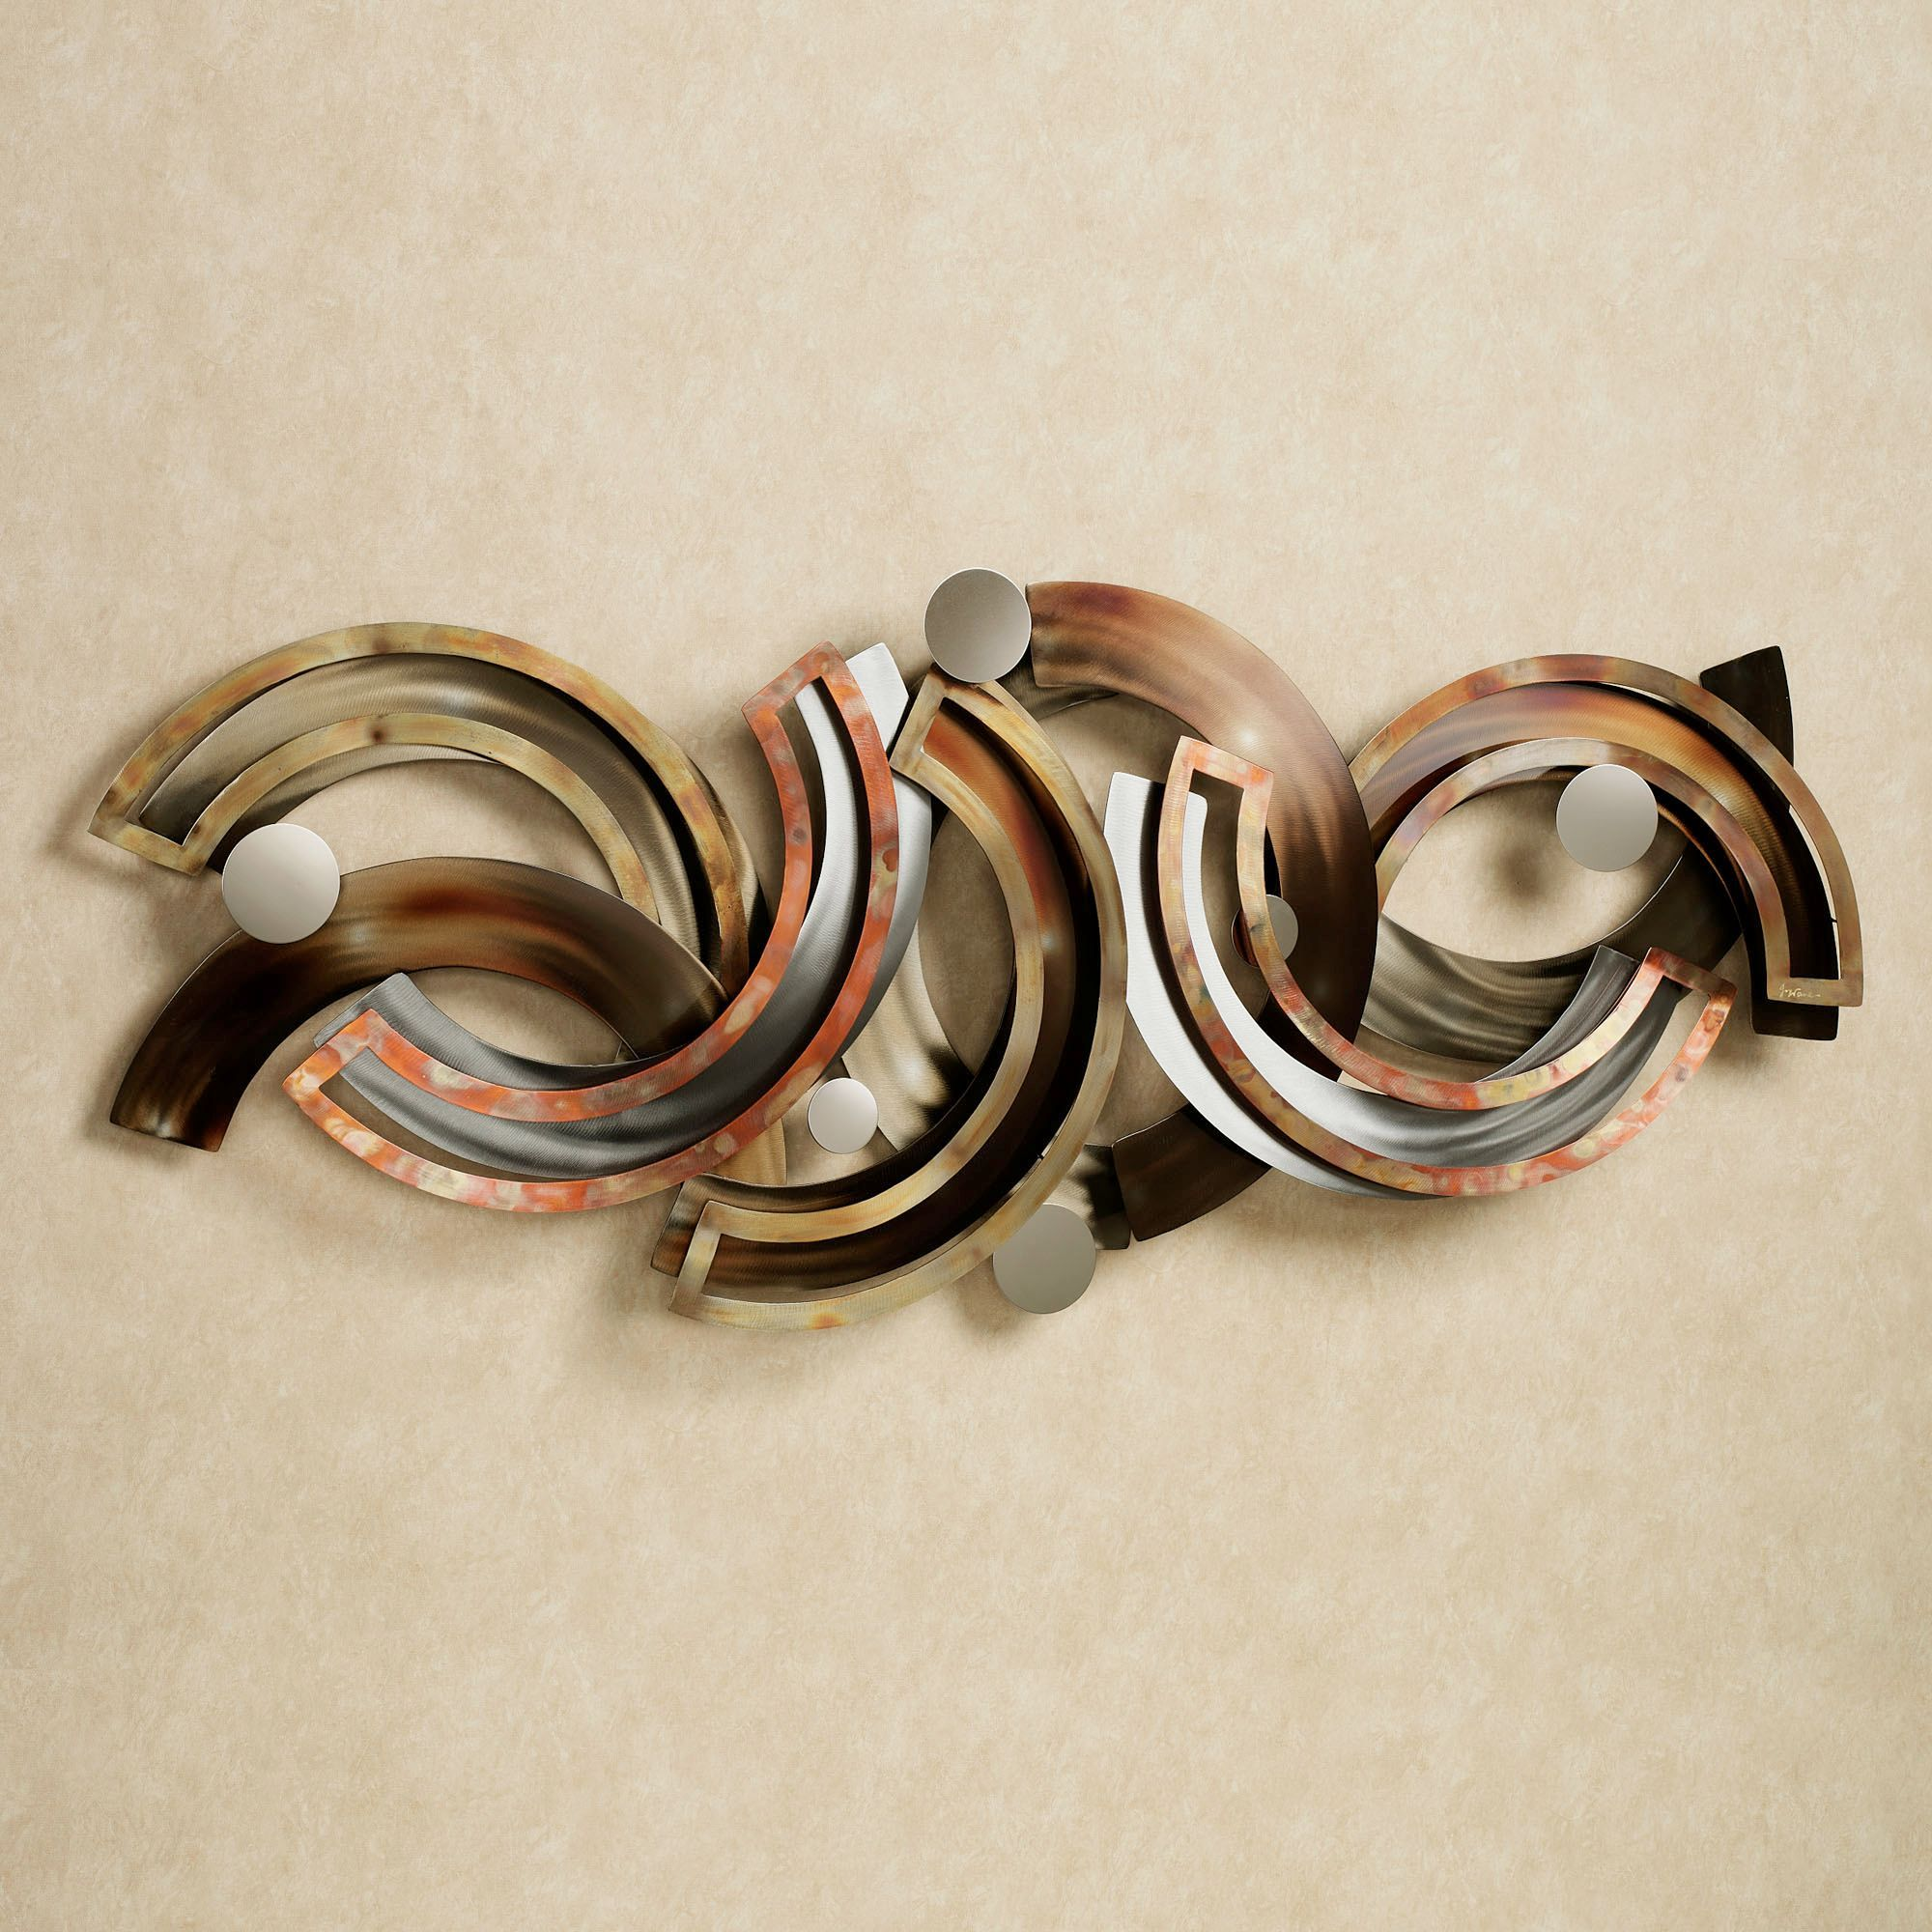 Metal Wall Sculpture Rejoice Abstract Metal Wall Sculpturejasonw Studios  Metal